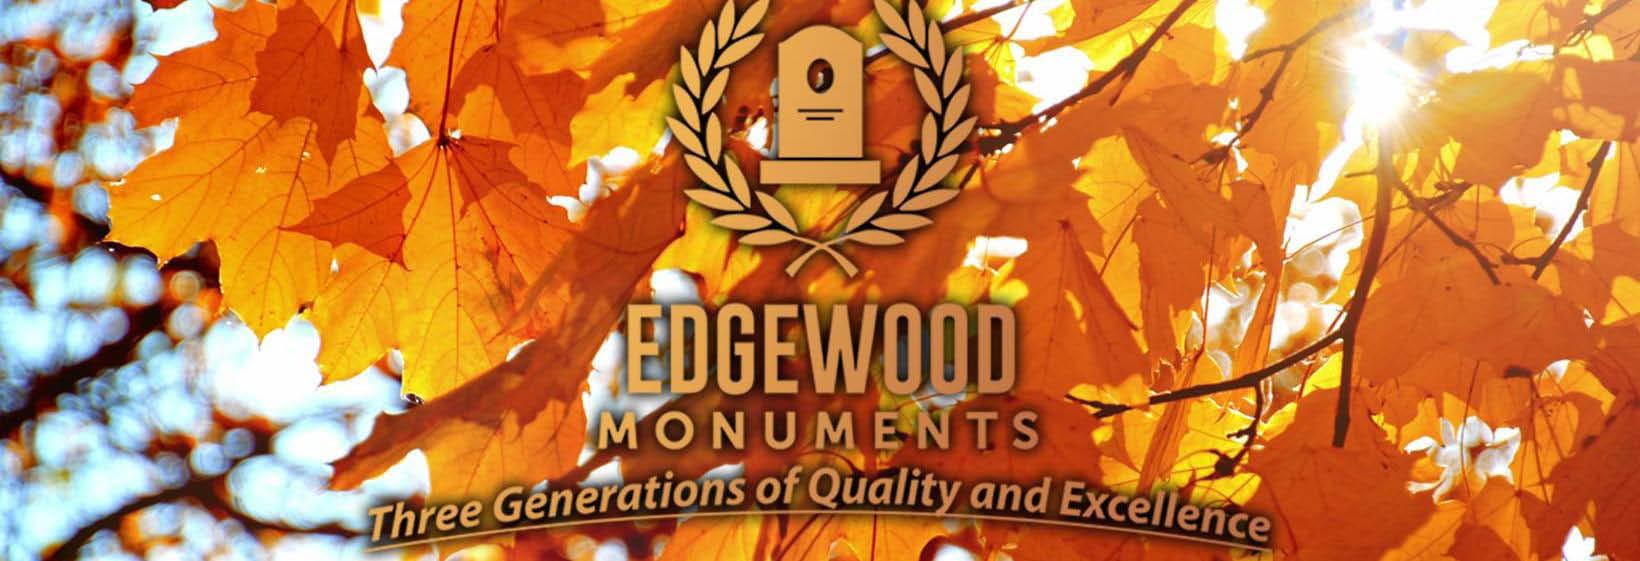 Edgewood Monuments main banner image - Puyallup, WA